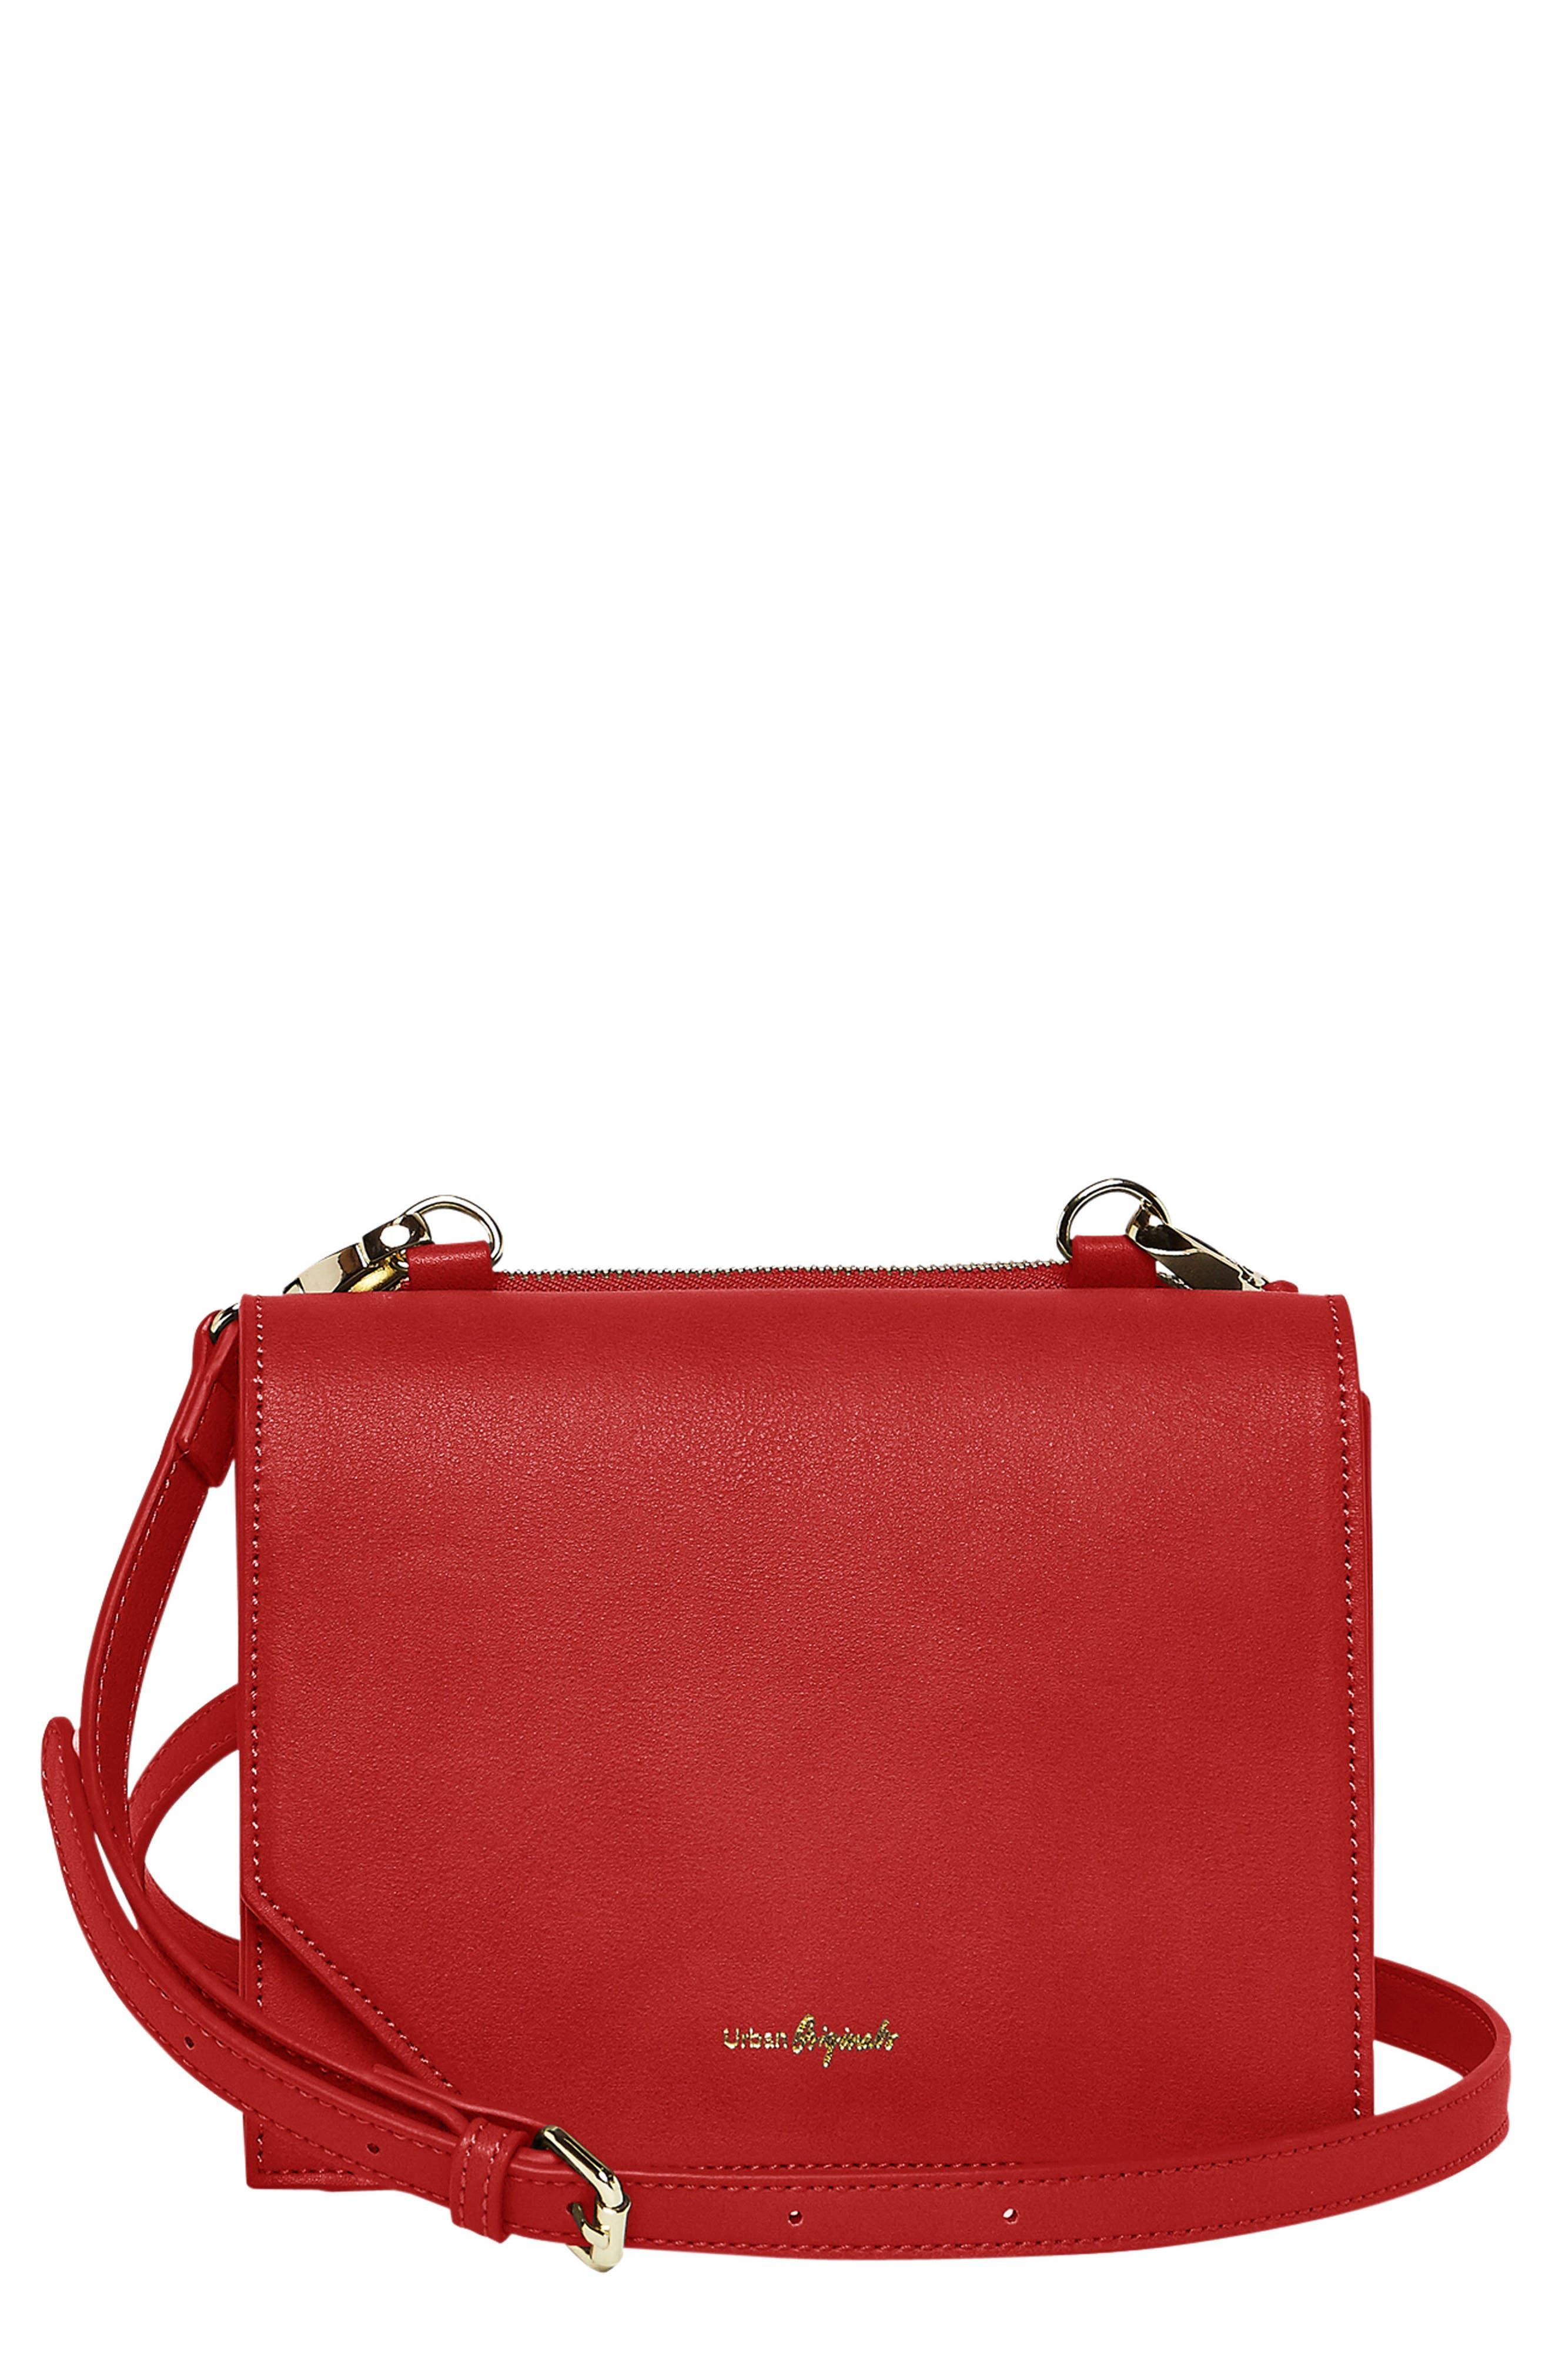 Shining Star Vegan Leather Crossbody Bag,                         Main,                         color, Red